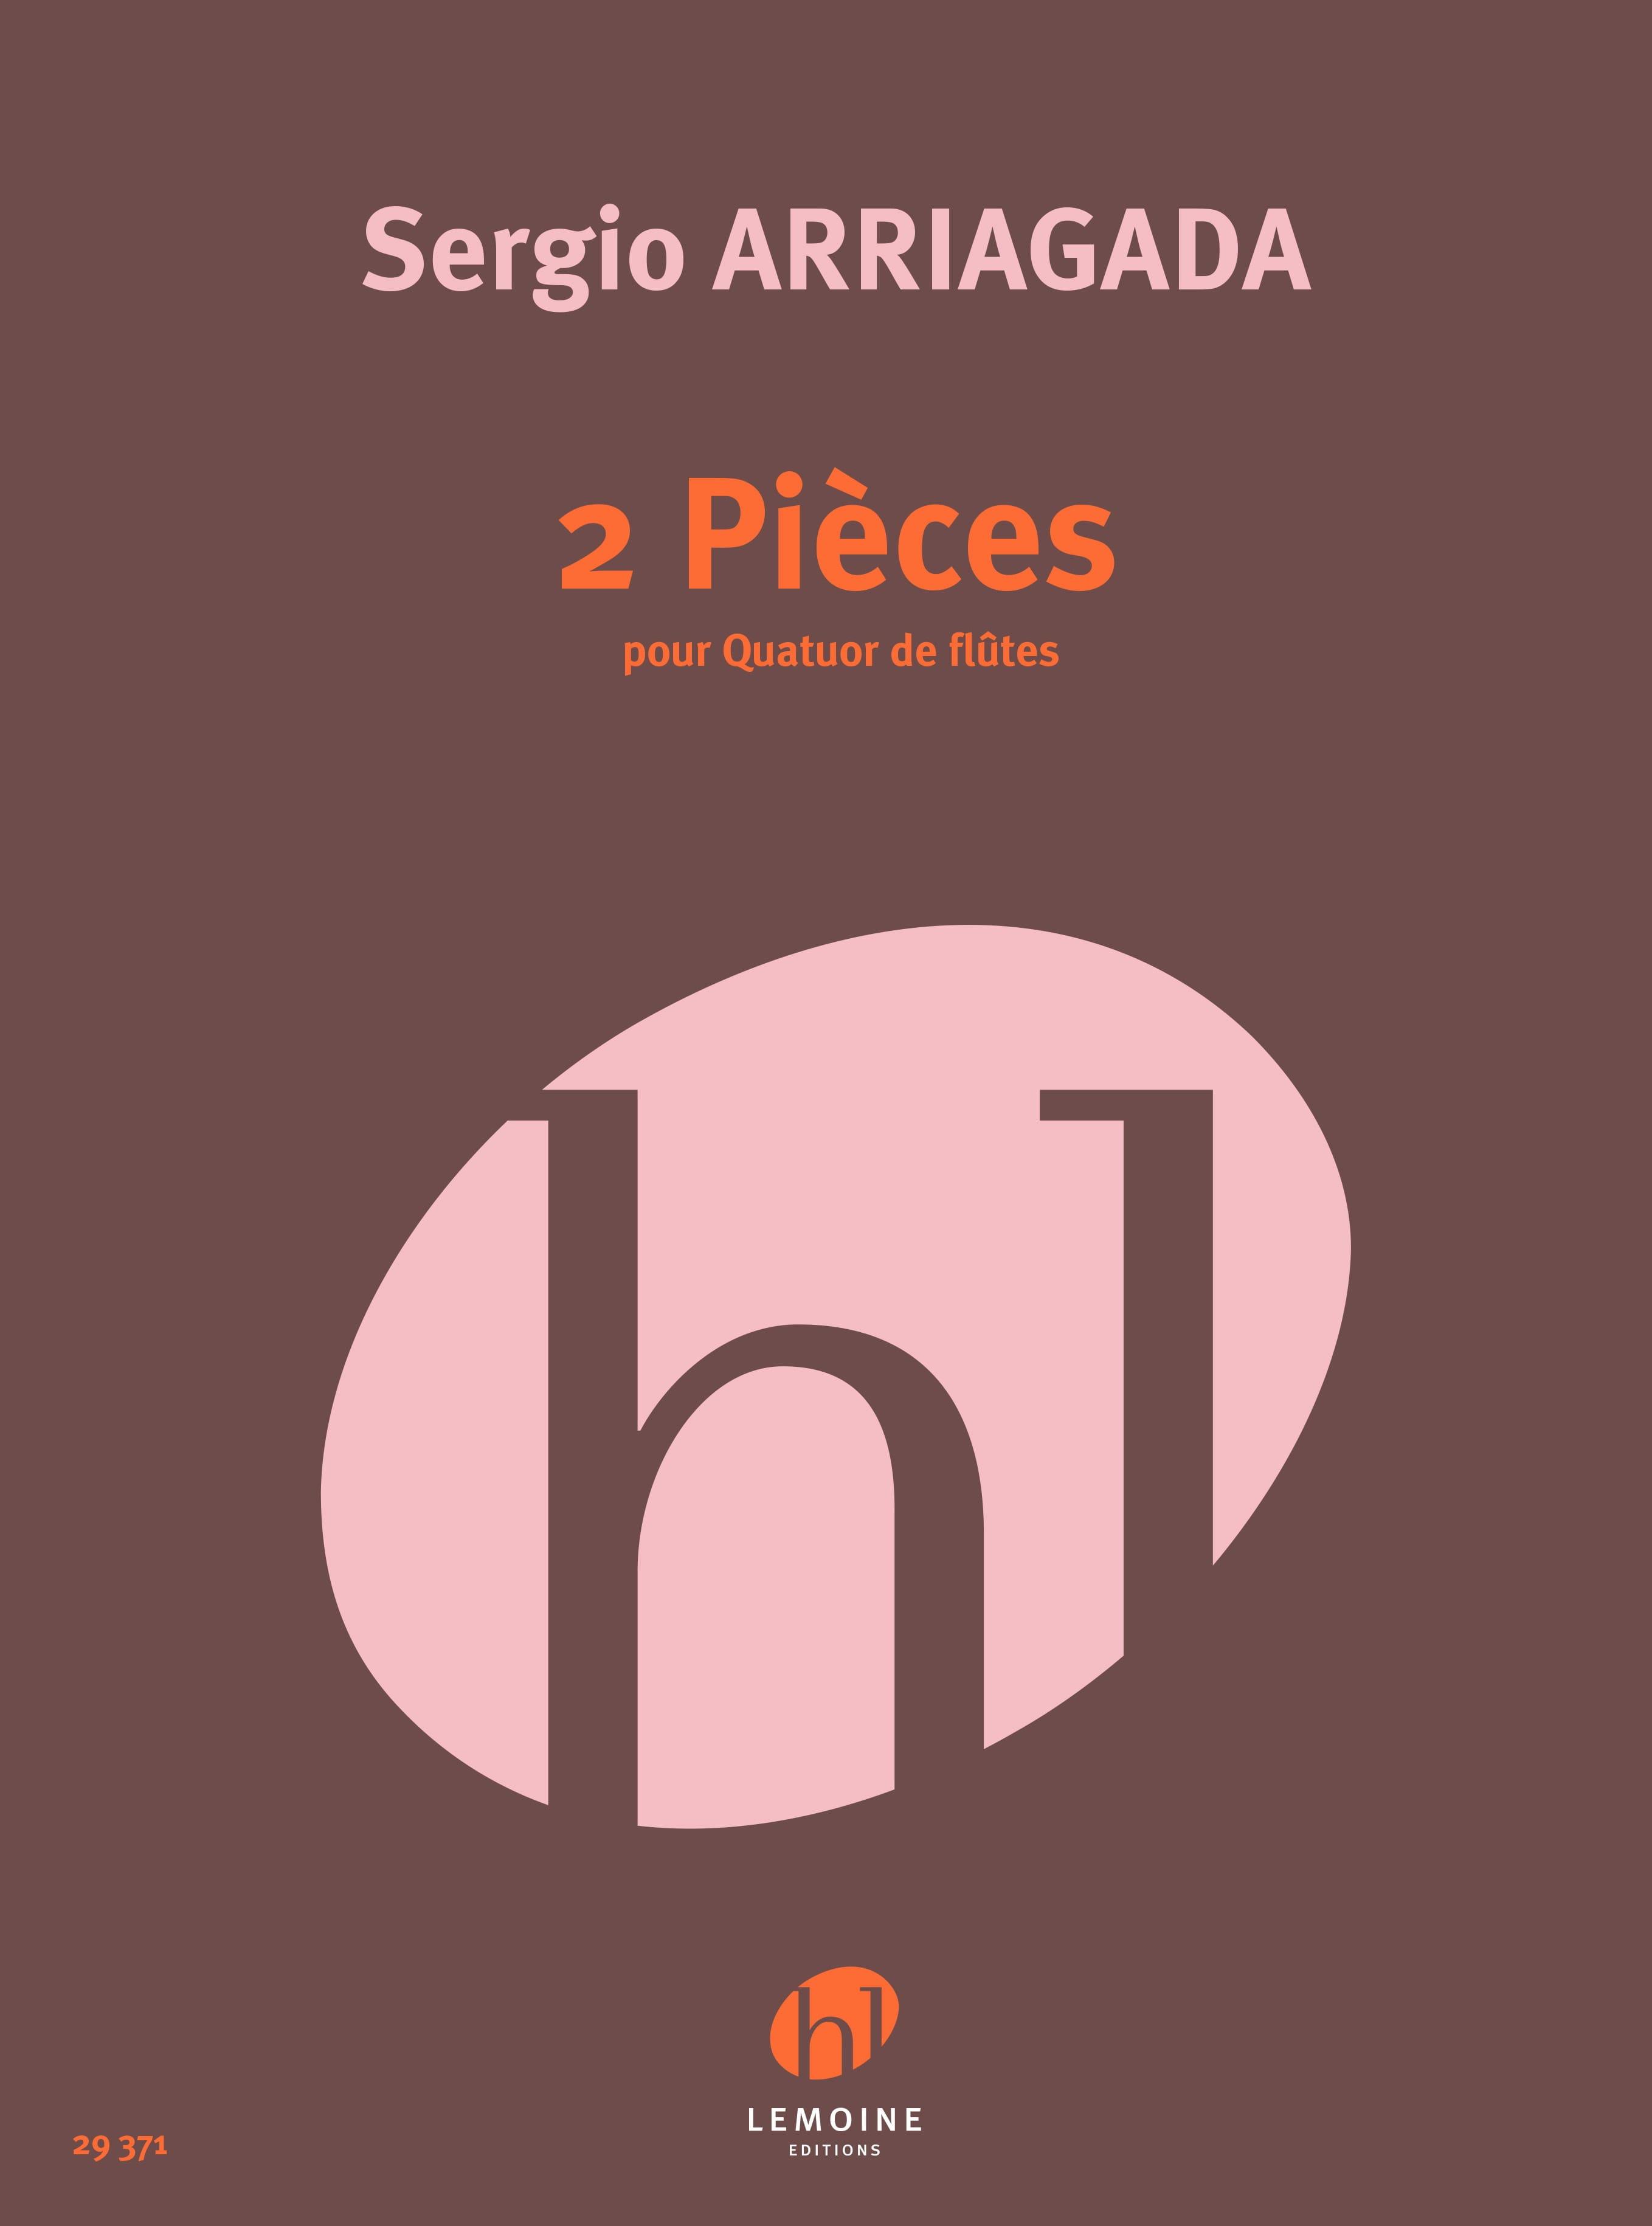 2 Pièces - 4 Flûtes - Sergio Arriagada - Partition - laflutedepan.com